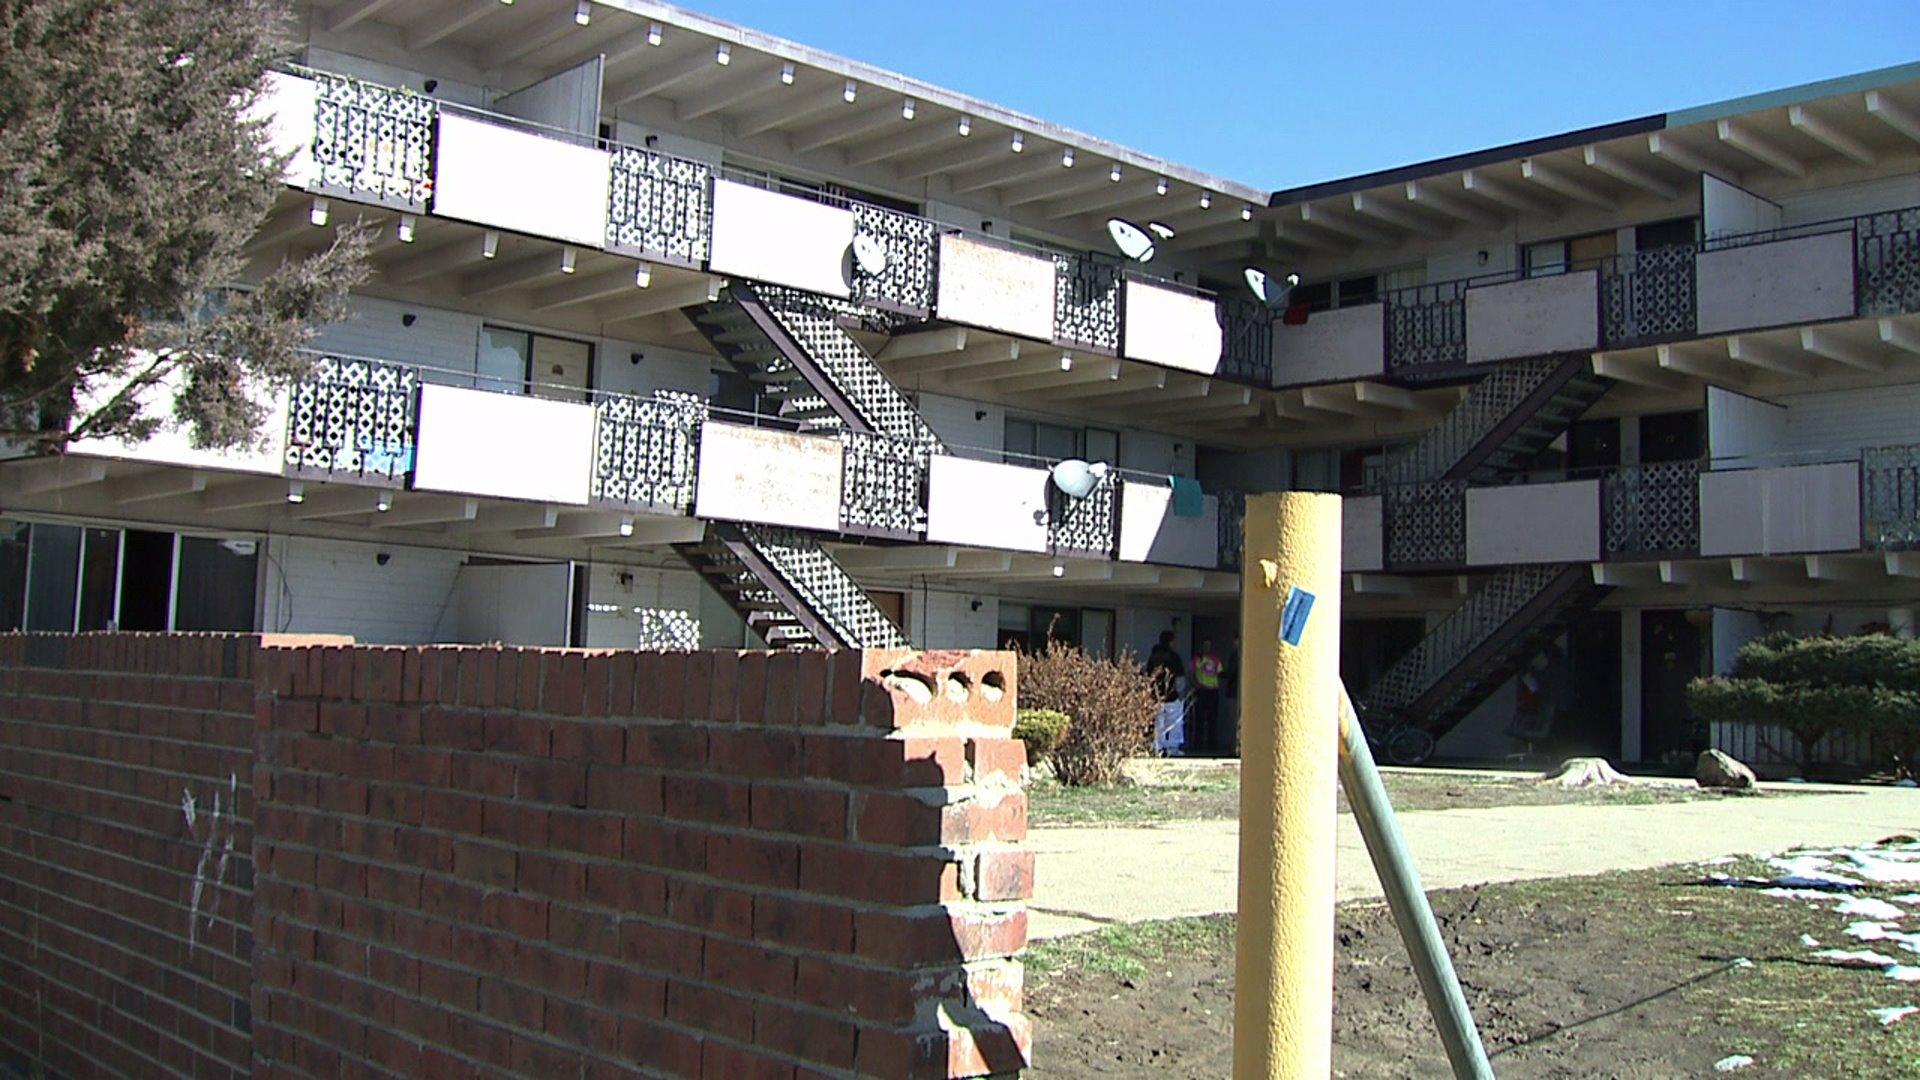 Lack of affordable housing a problem in Denver